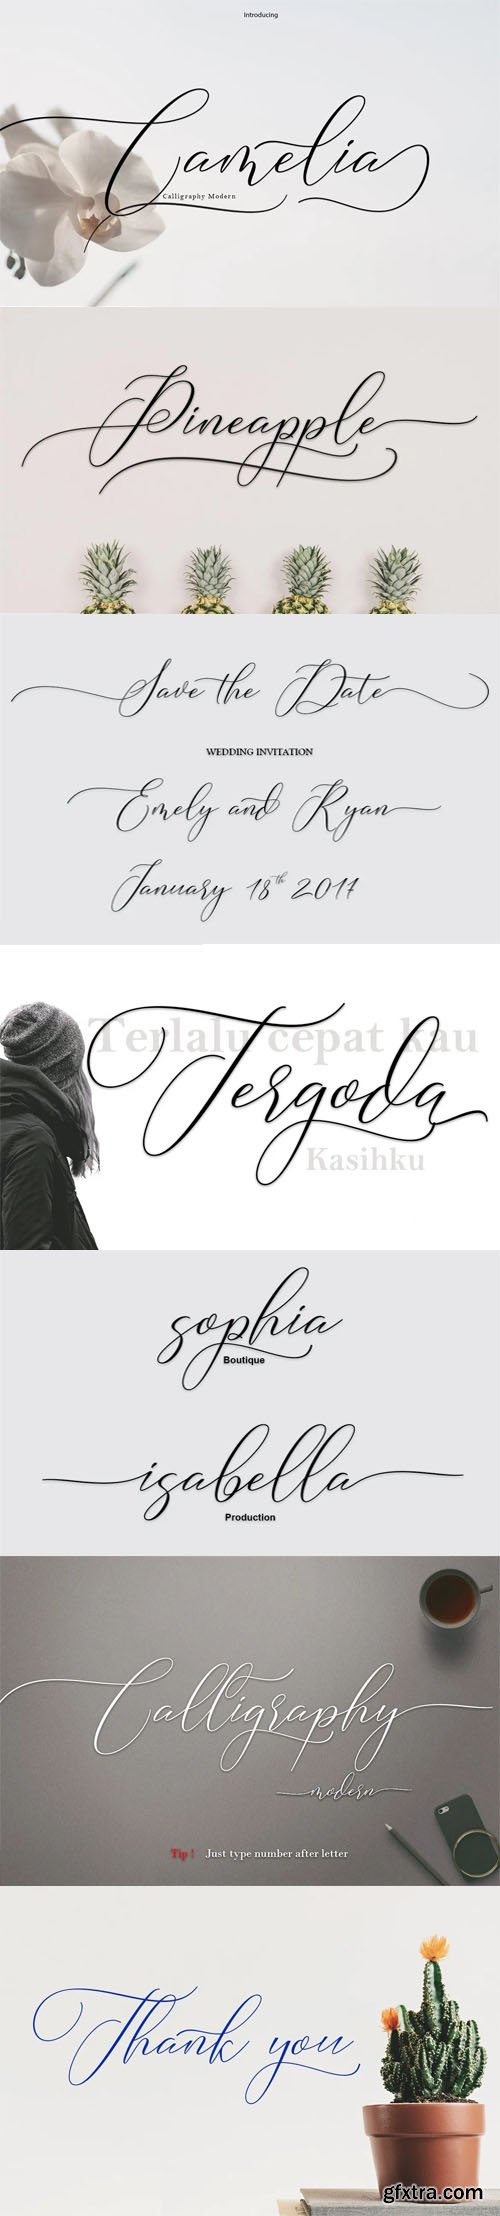 Camelia Calligraphy - Modern Script Typeface